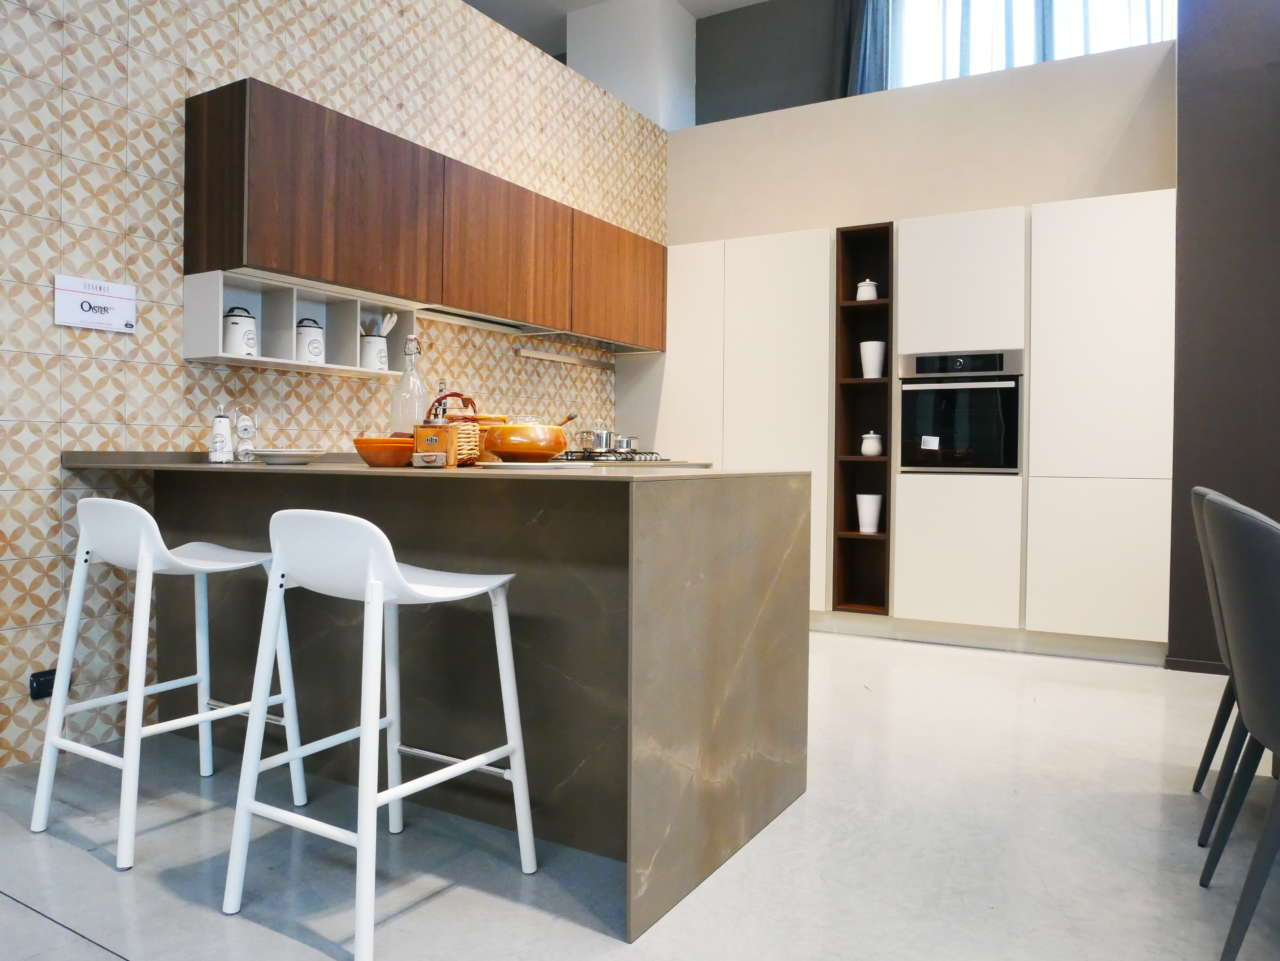 GalleryHouse_Altamura_BA_cucina_penisola_legno_bianca_pietra